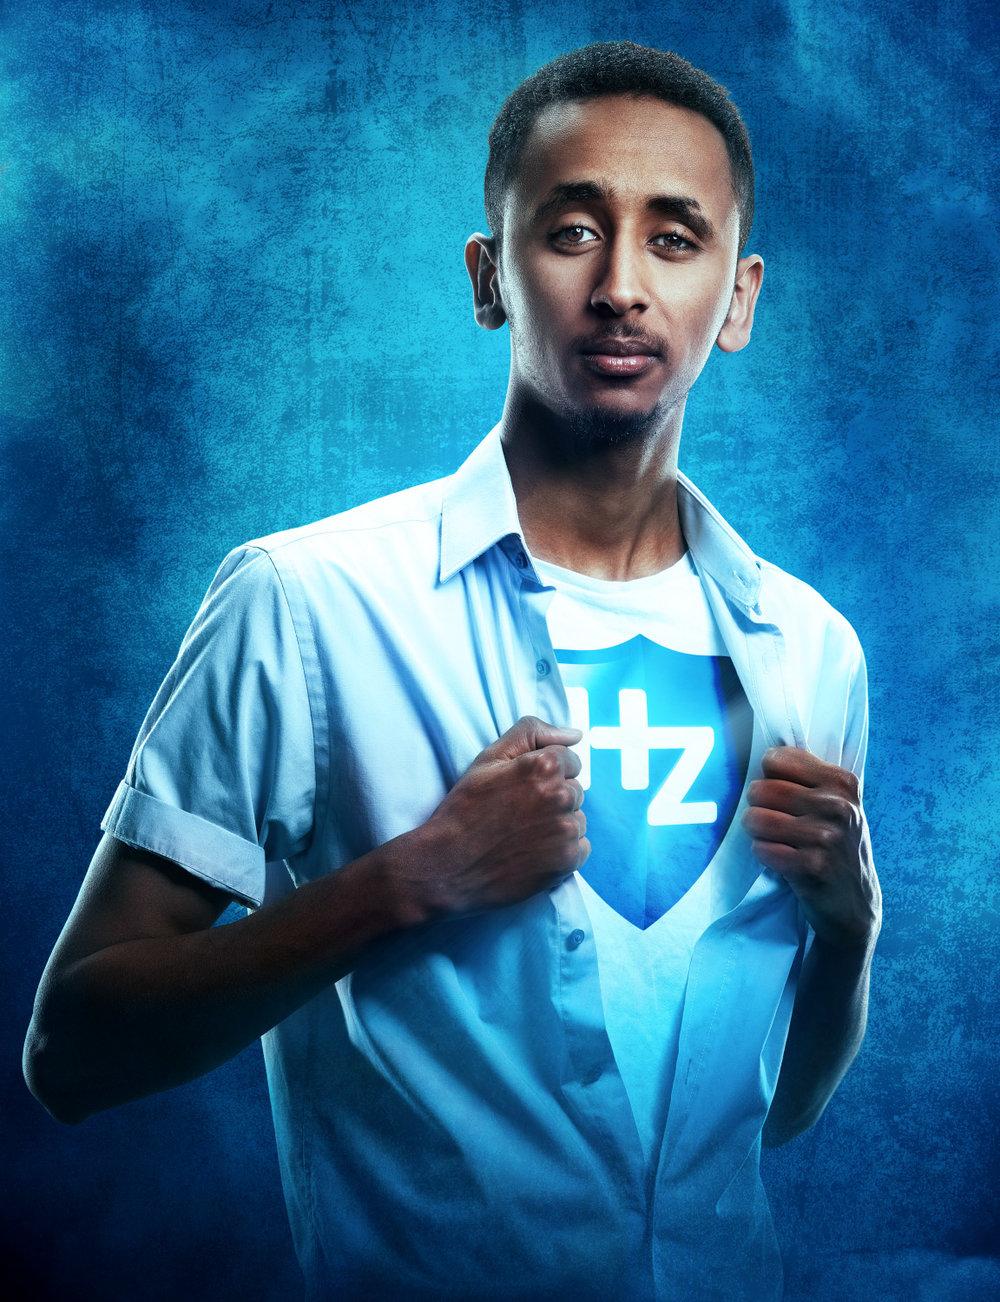 Copy of Voorbeeld Chromakey shot voor 'Discover your power with HZ' campagne